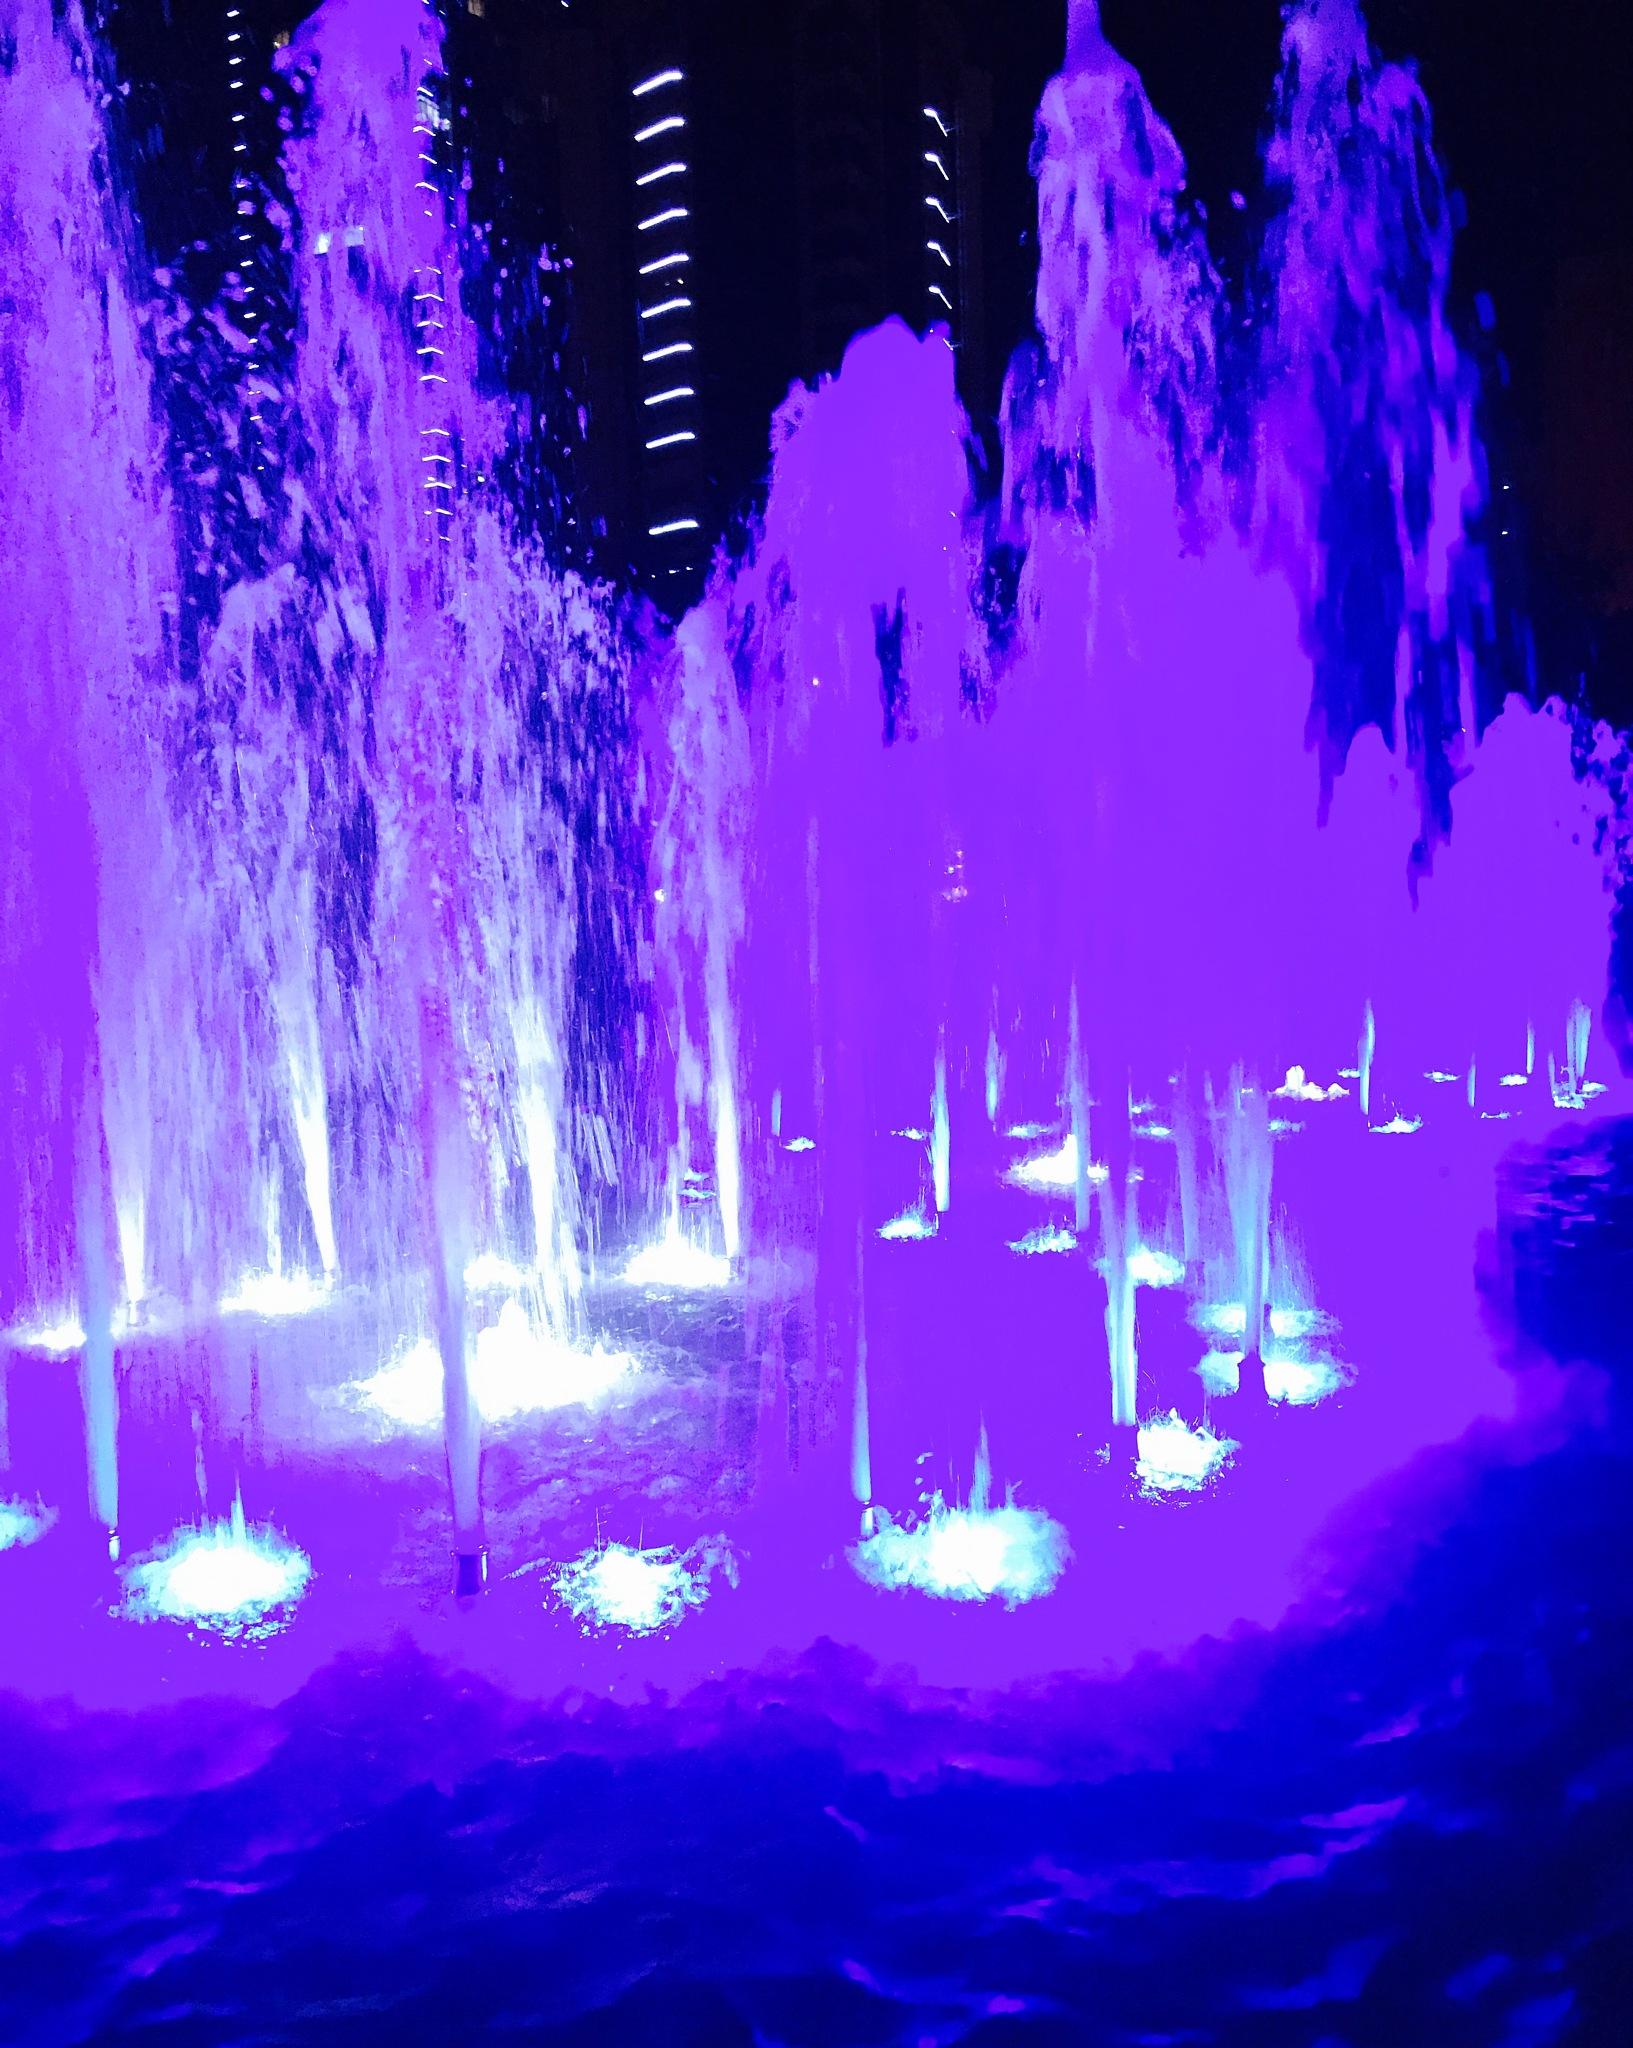 Violets by iensueno